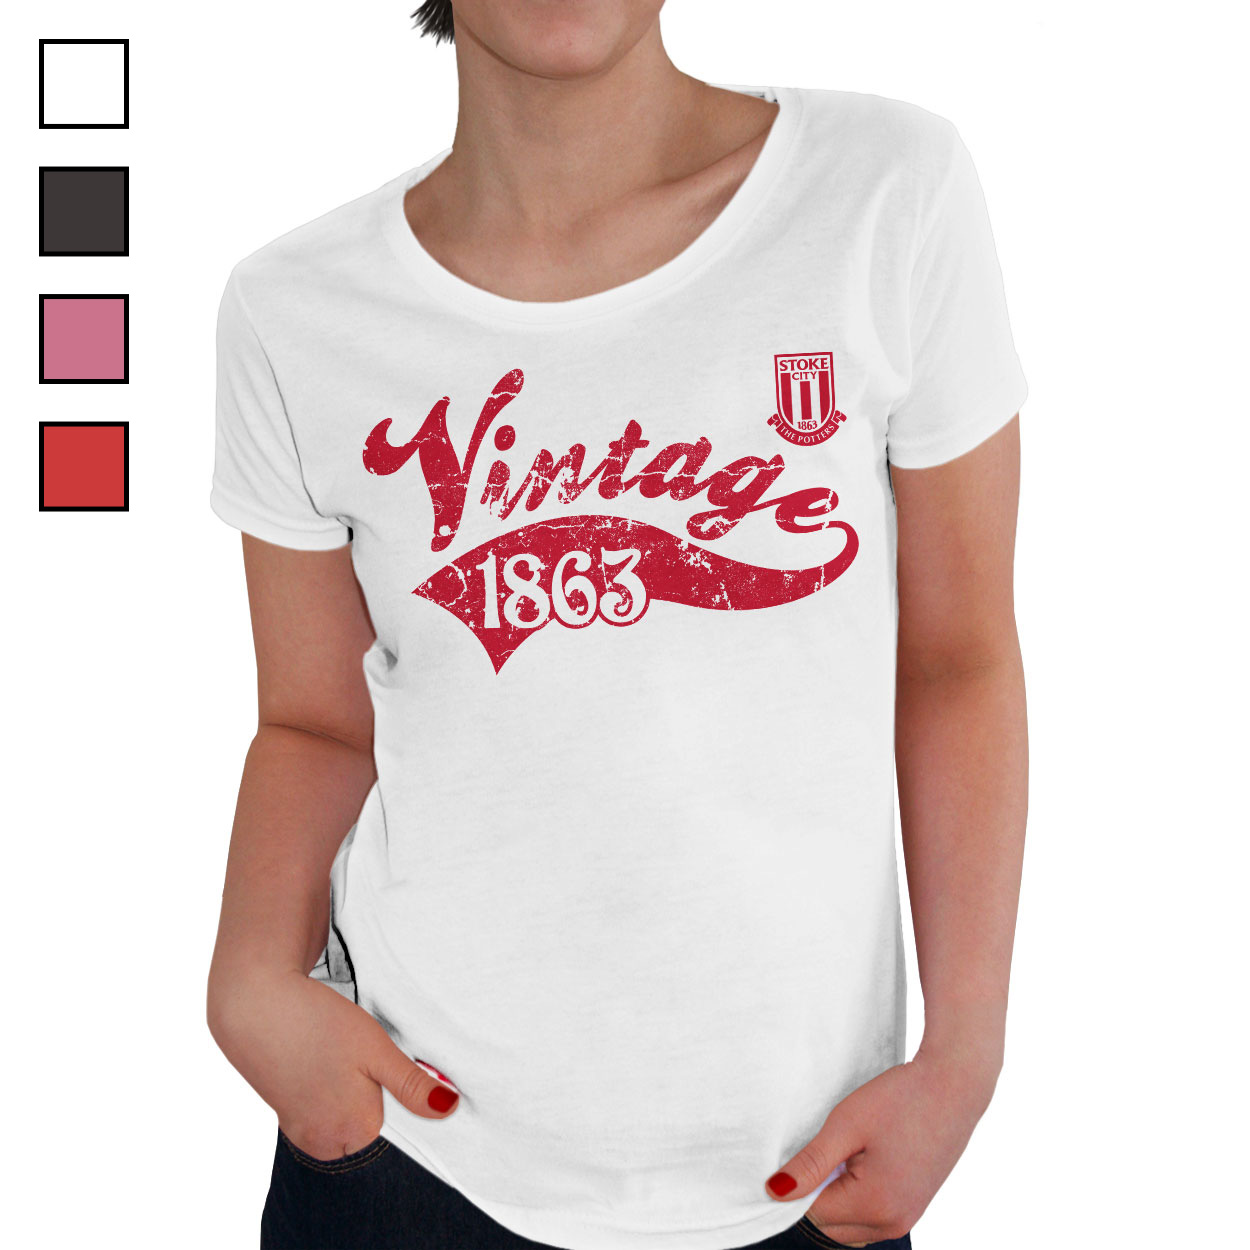 Stoke City FC Ladies Vintage T-Shirt